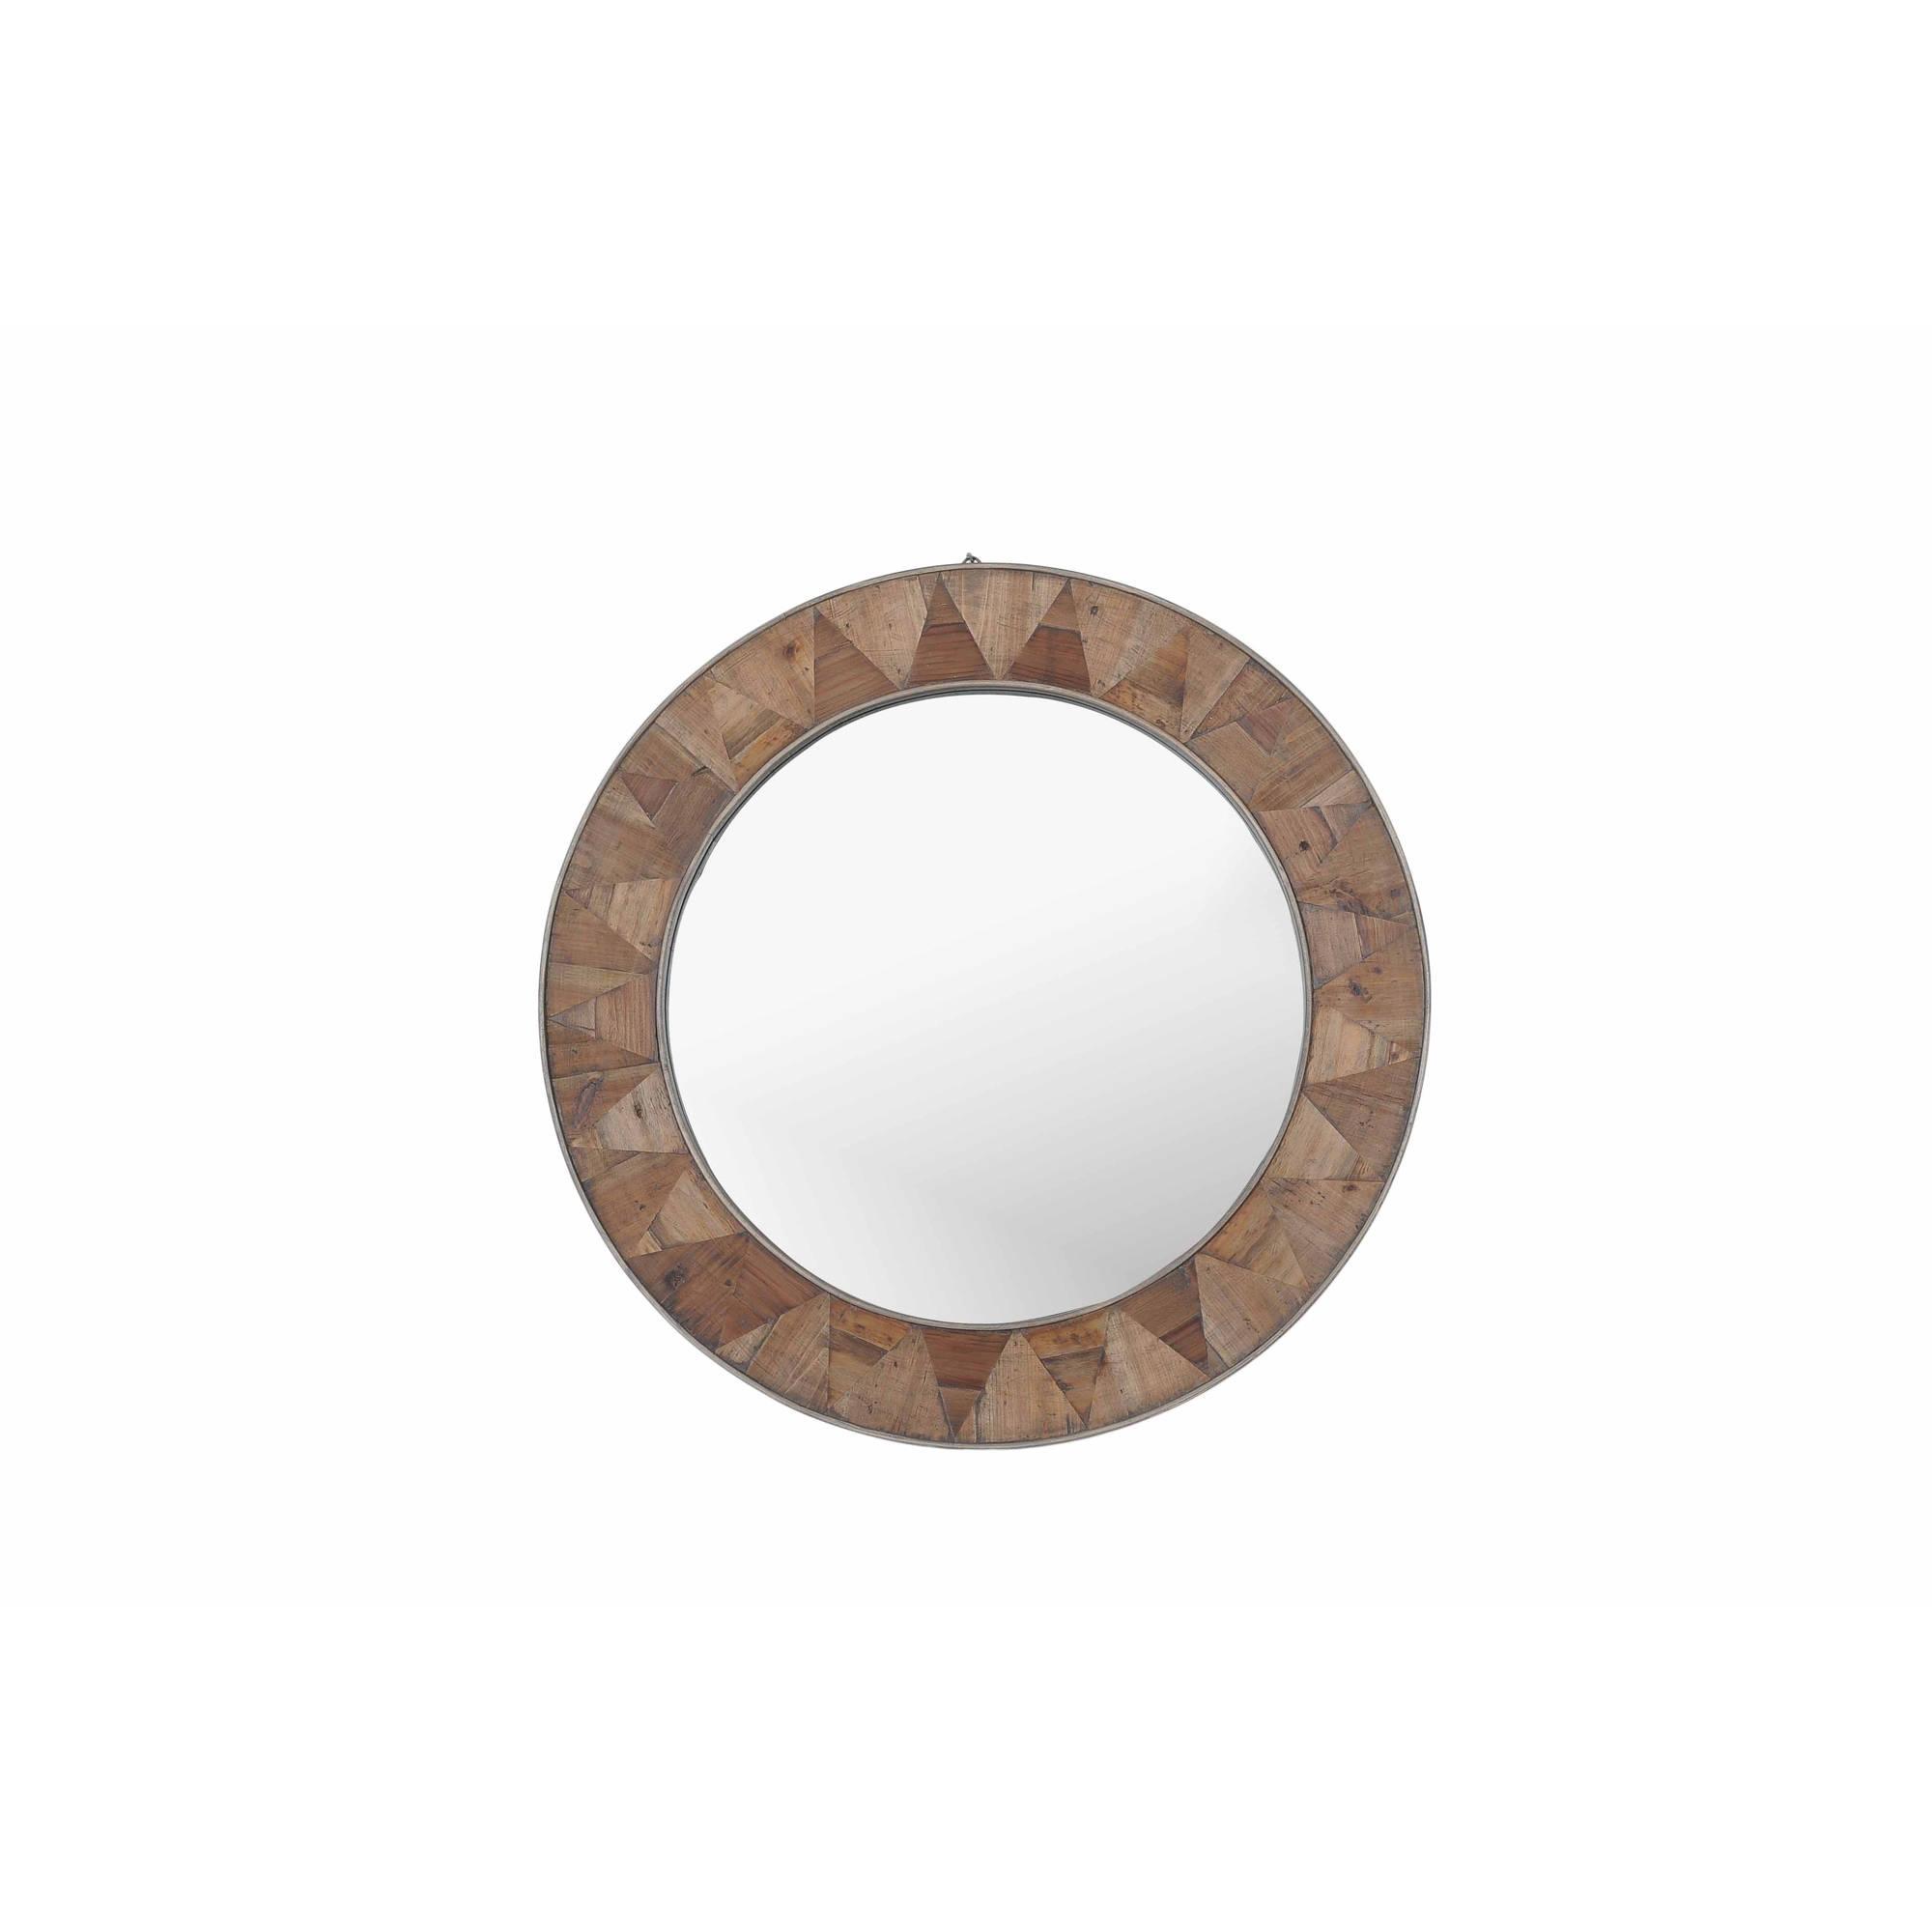 "Sunjoy 130201007 Recycled Fir Wood Wide Border Round Mirror, 31.5"" by SunNest Services LLC"